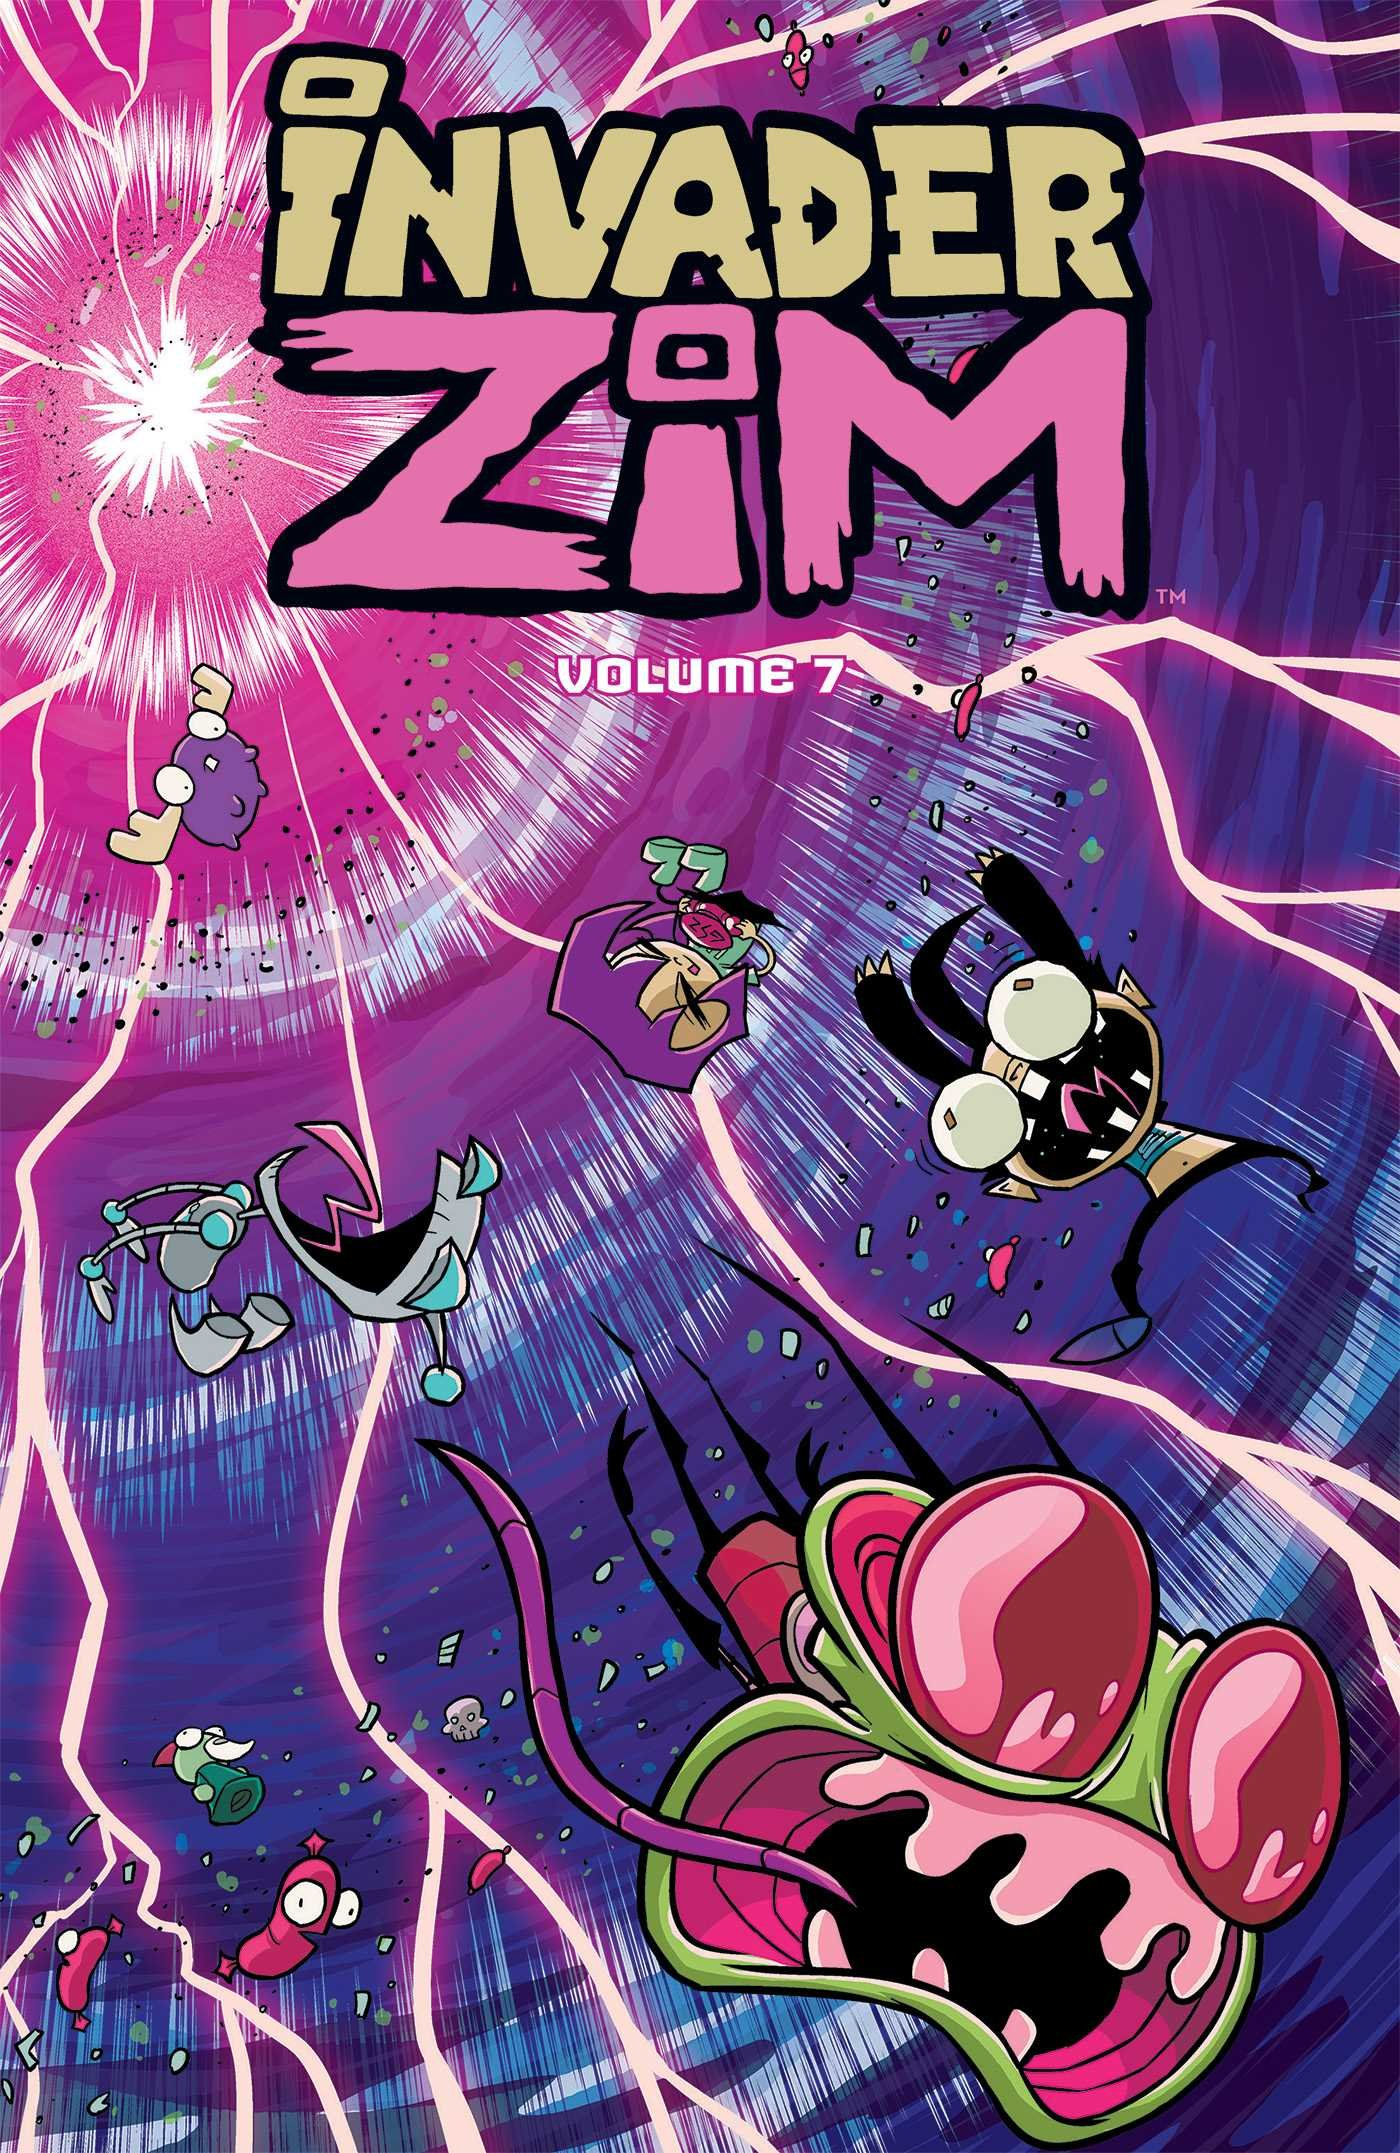 Invader ZIM Vol. 7 by Oni Press (Image #1)